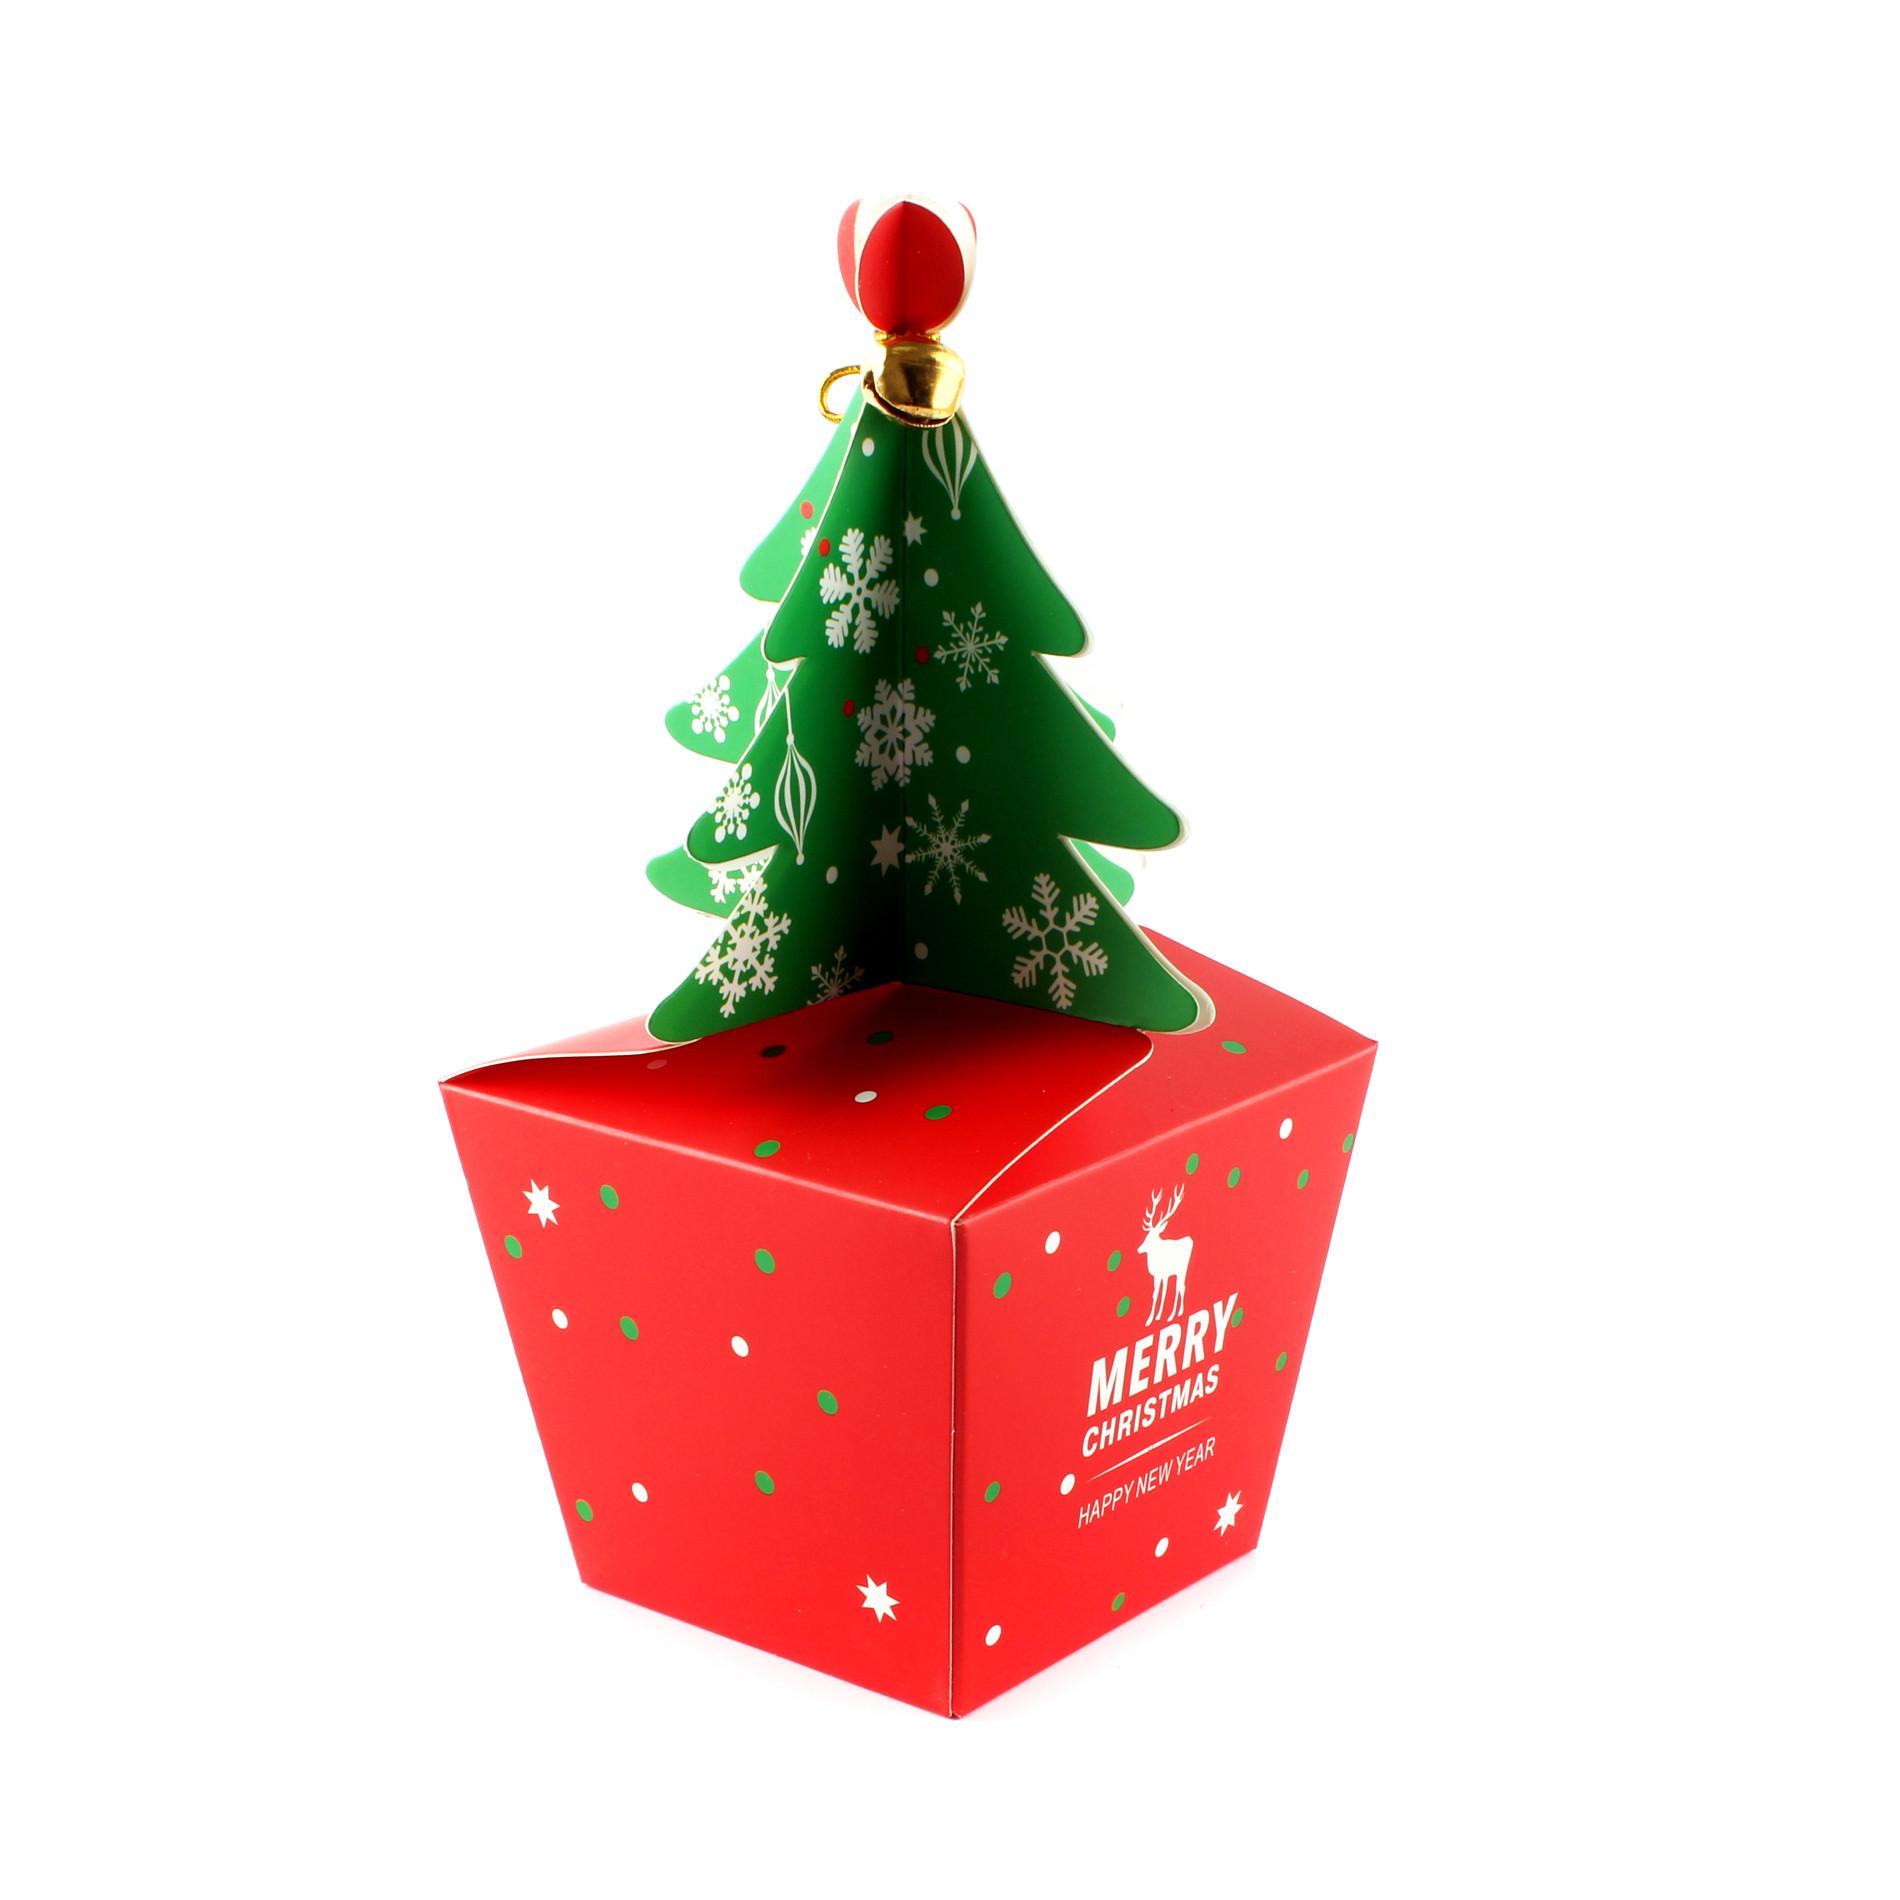 Christmas Candy Boxes  5PCS Xmas Christmas Gift Boxes Christmas Eve Apple Box